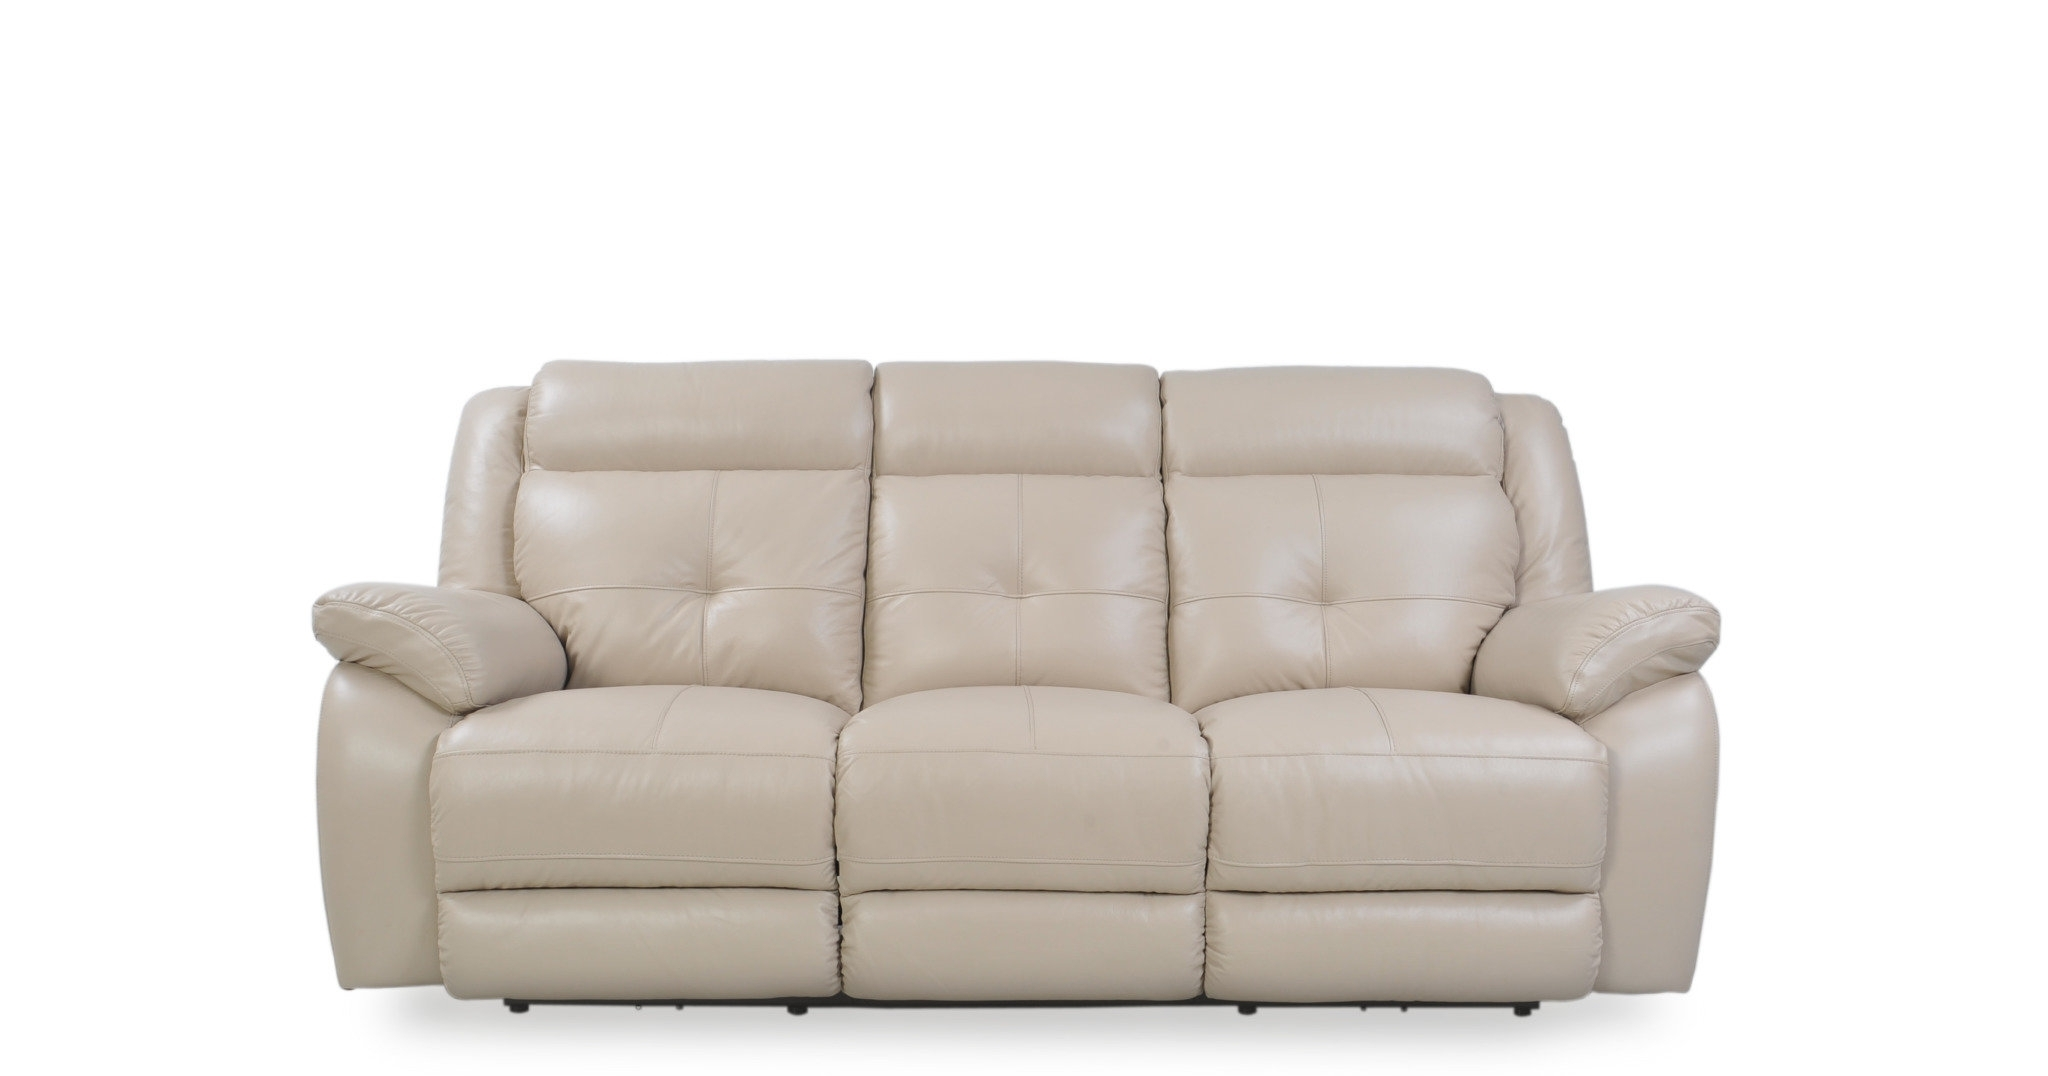 Red Barrel Studio Oshawa Reclining Sofa   Wayfair With Regard To Oshawa Sectional Sofas (View 10 of 10)